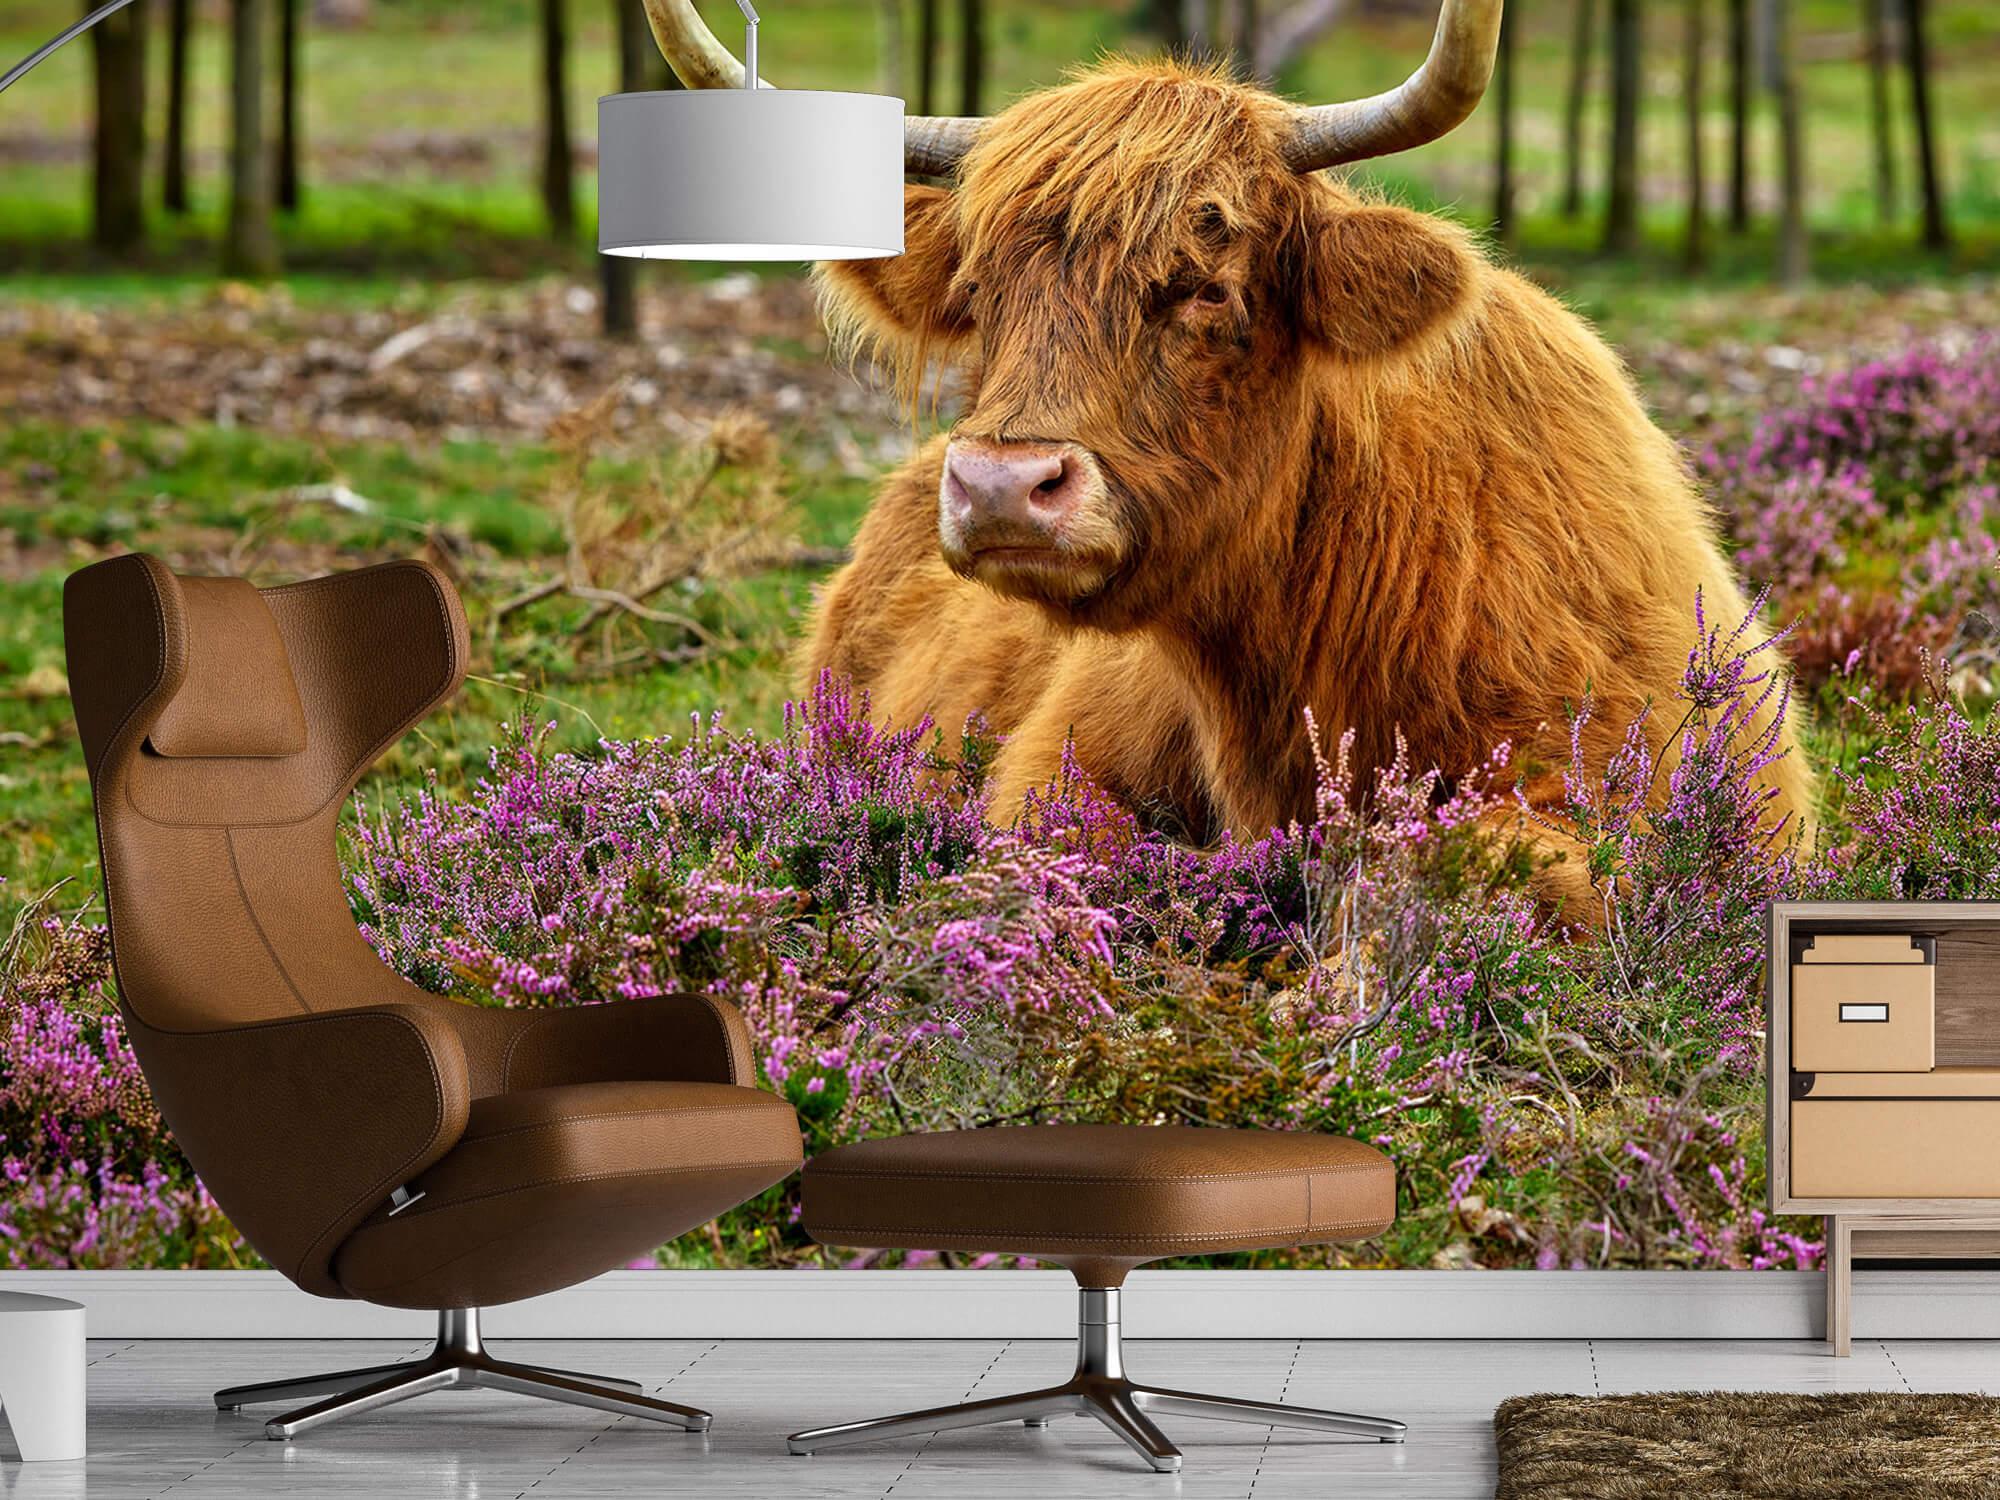 Hooglanders - Schotse hooglander tussen paarse heide 19